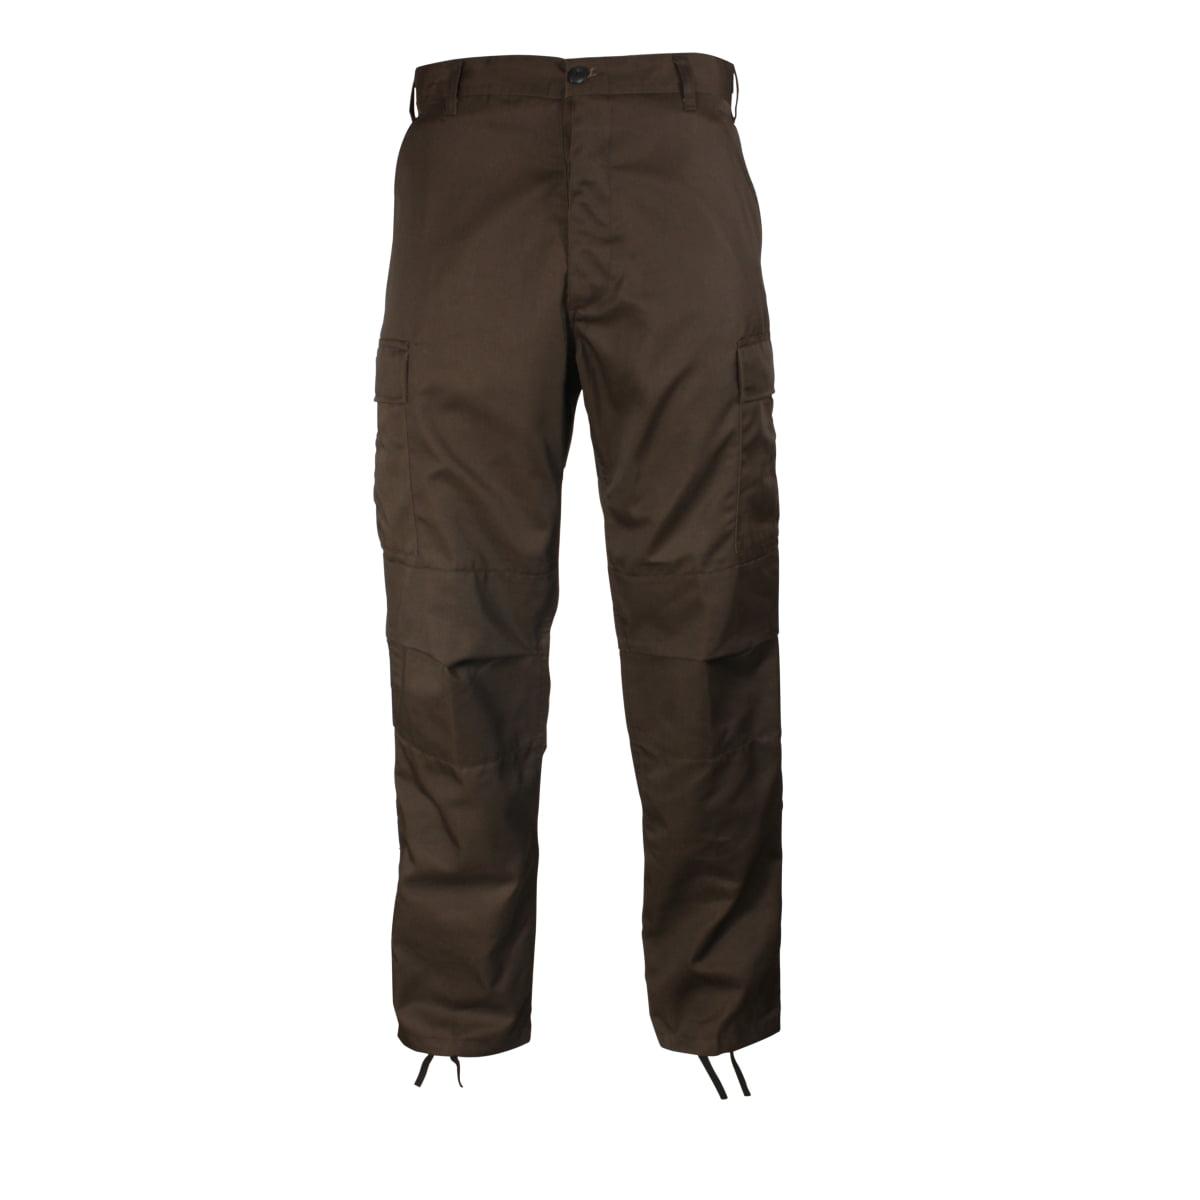 Rothco Brown BDU Pants, Mens Military Fatigues, Army BDUs